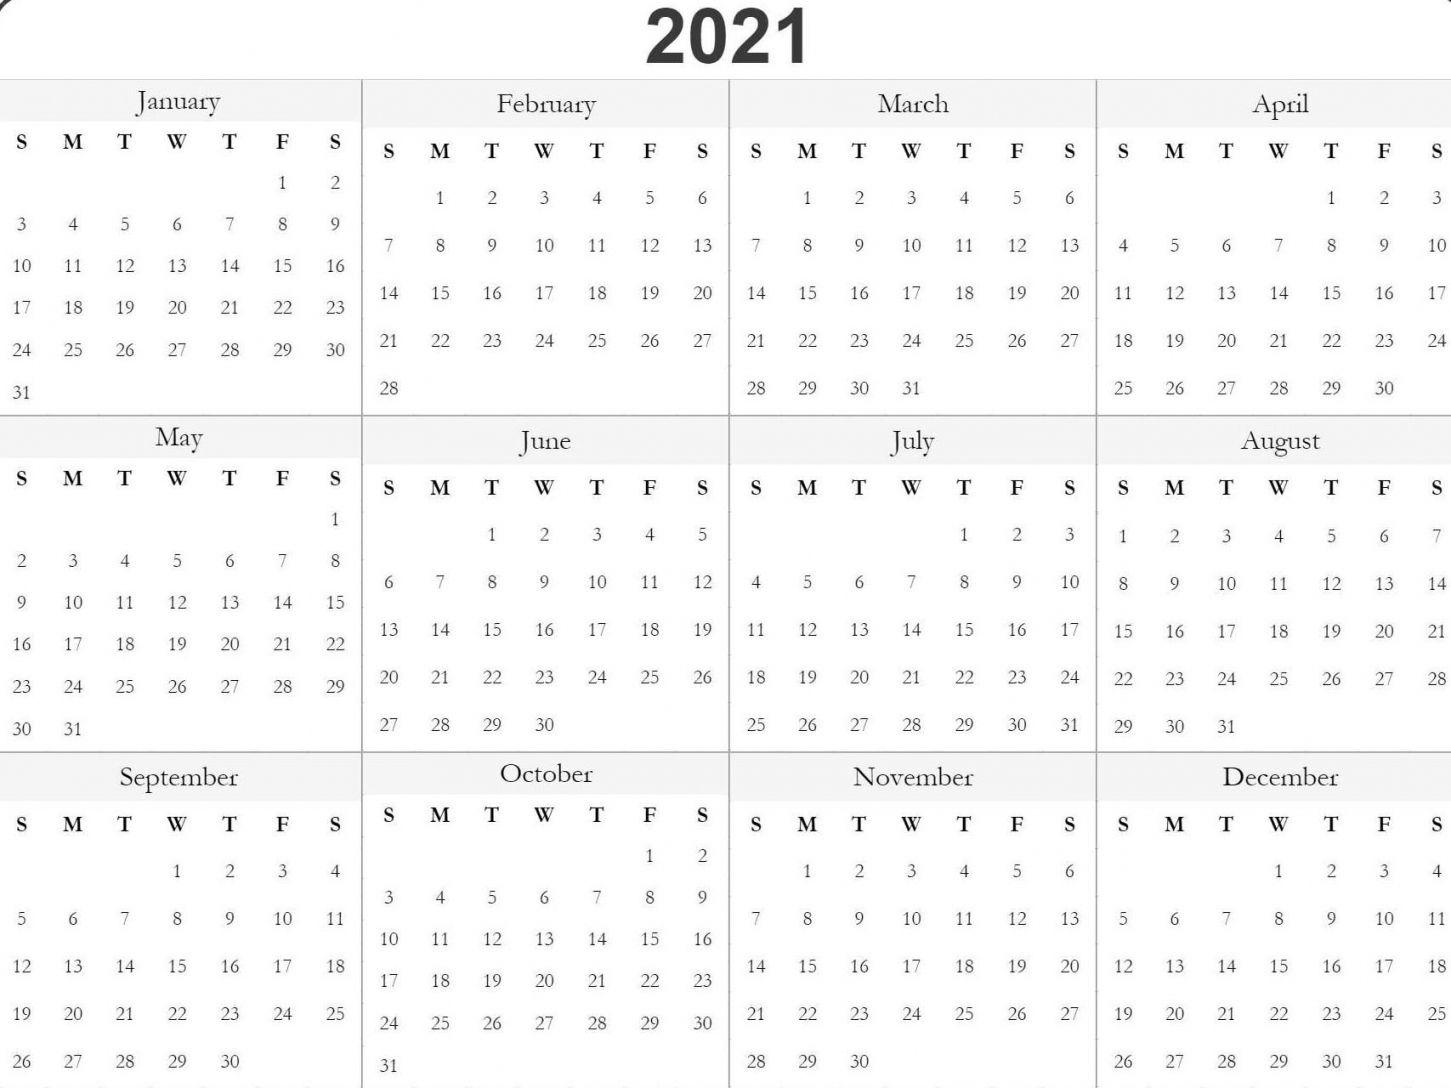 Printable 2021 Julian Date Calendar In 2020 | Free With Regard To Julian Date Conversion 2021